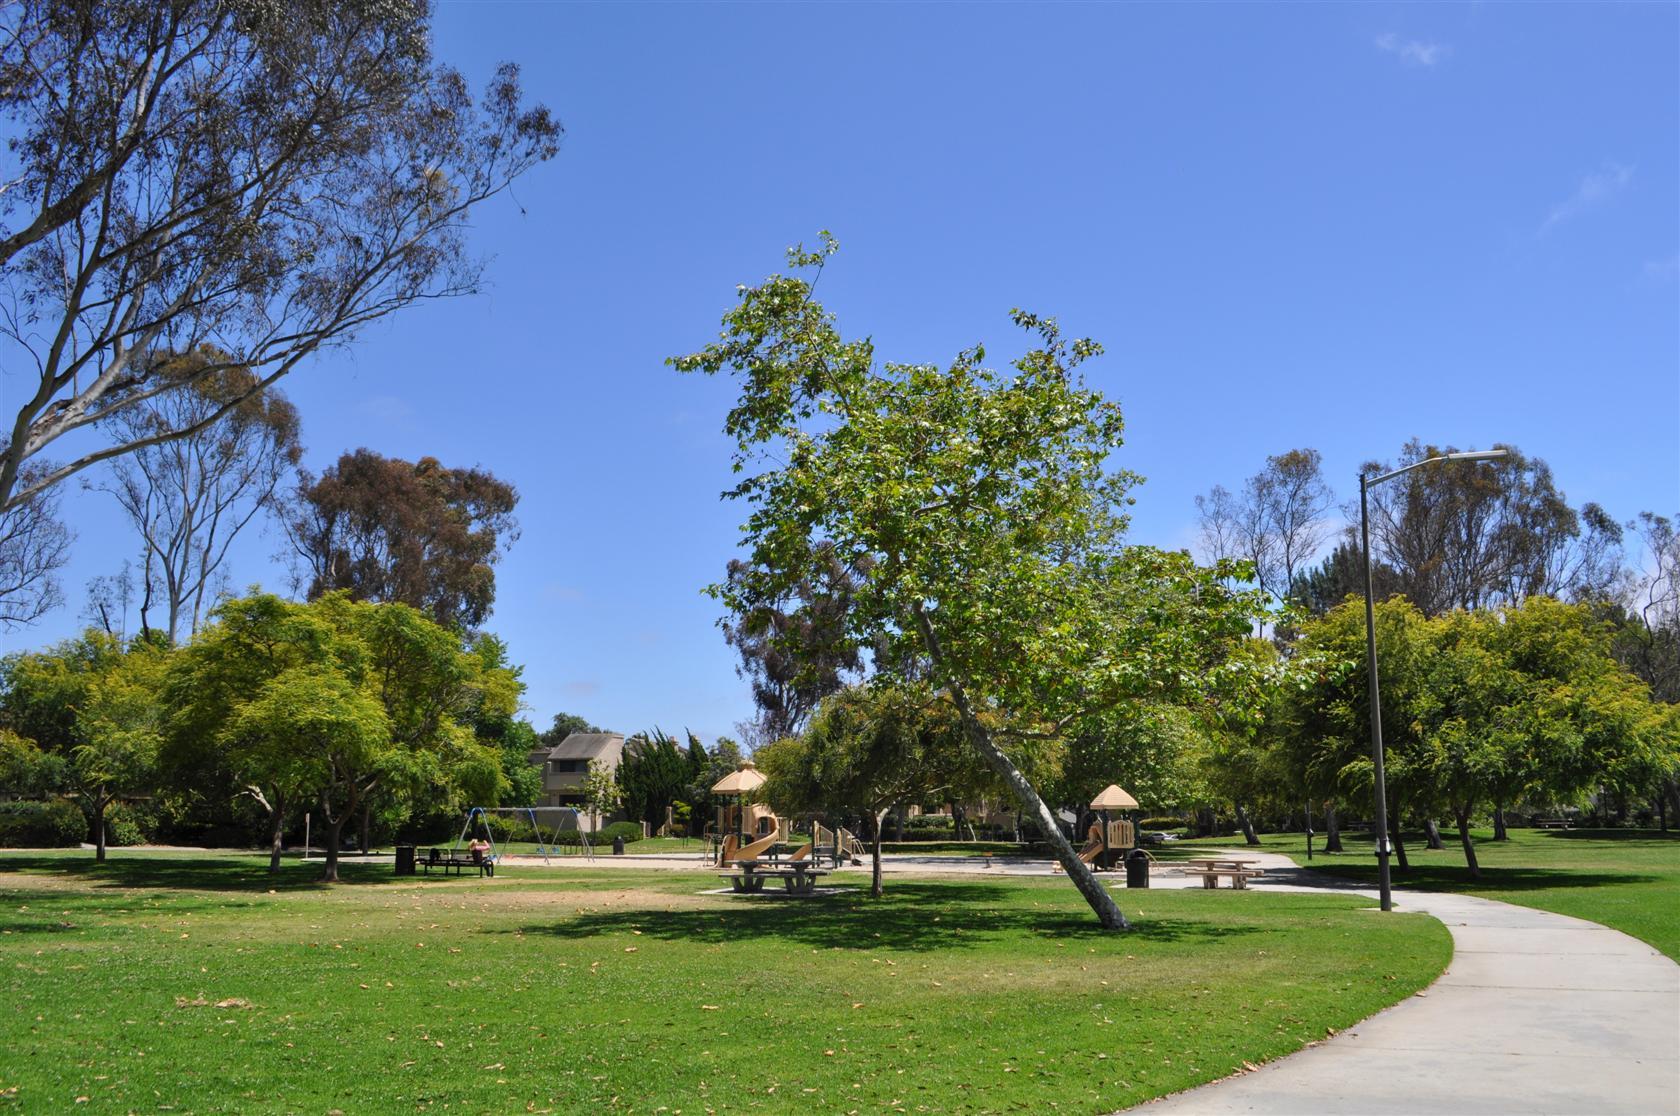 La Jolla Village in San Diego county California